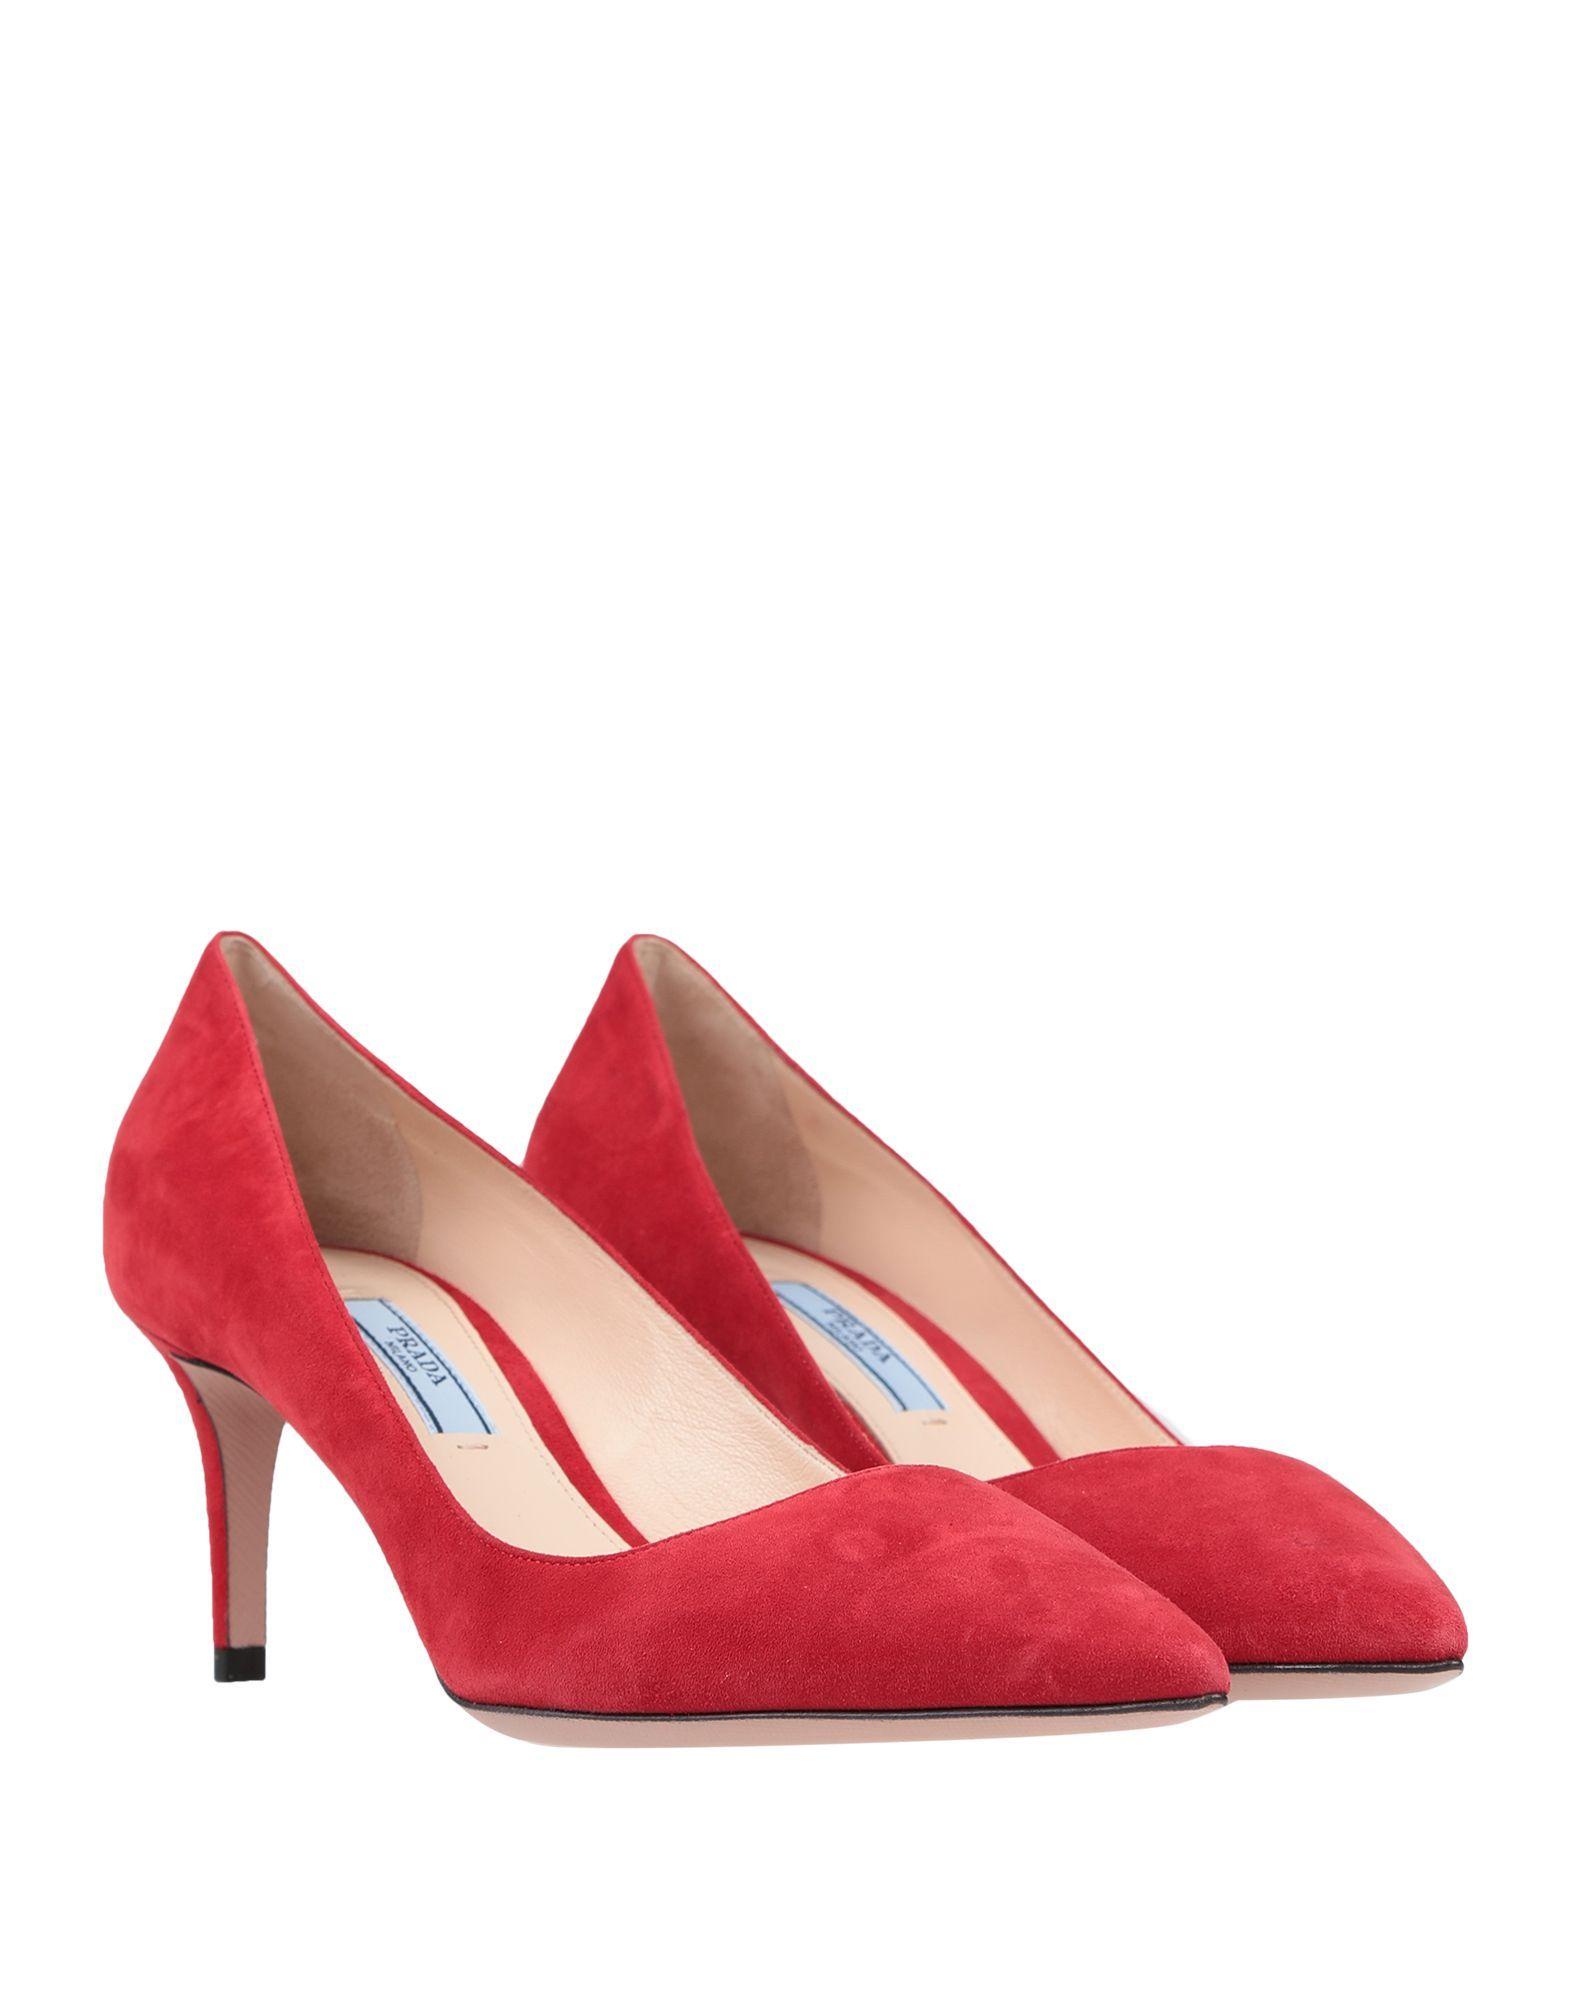 Prada Red Leather Court Shoe Heels